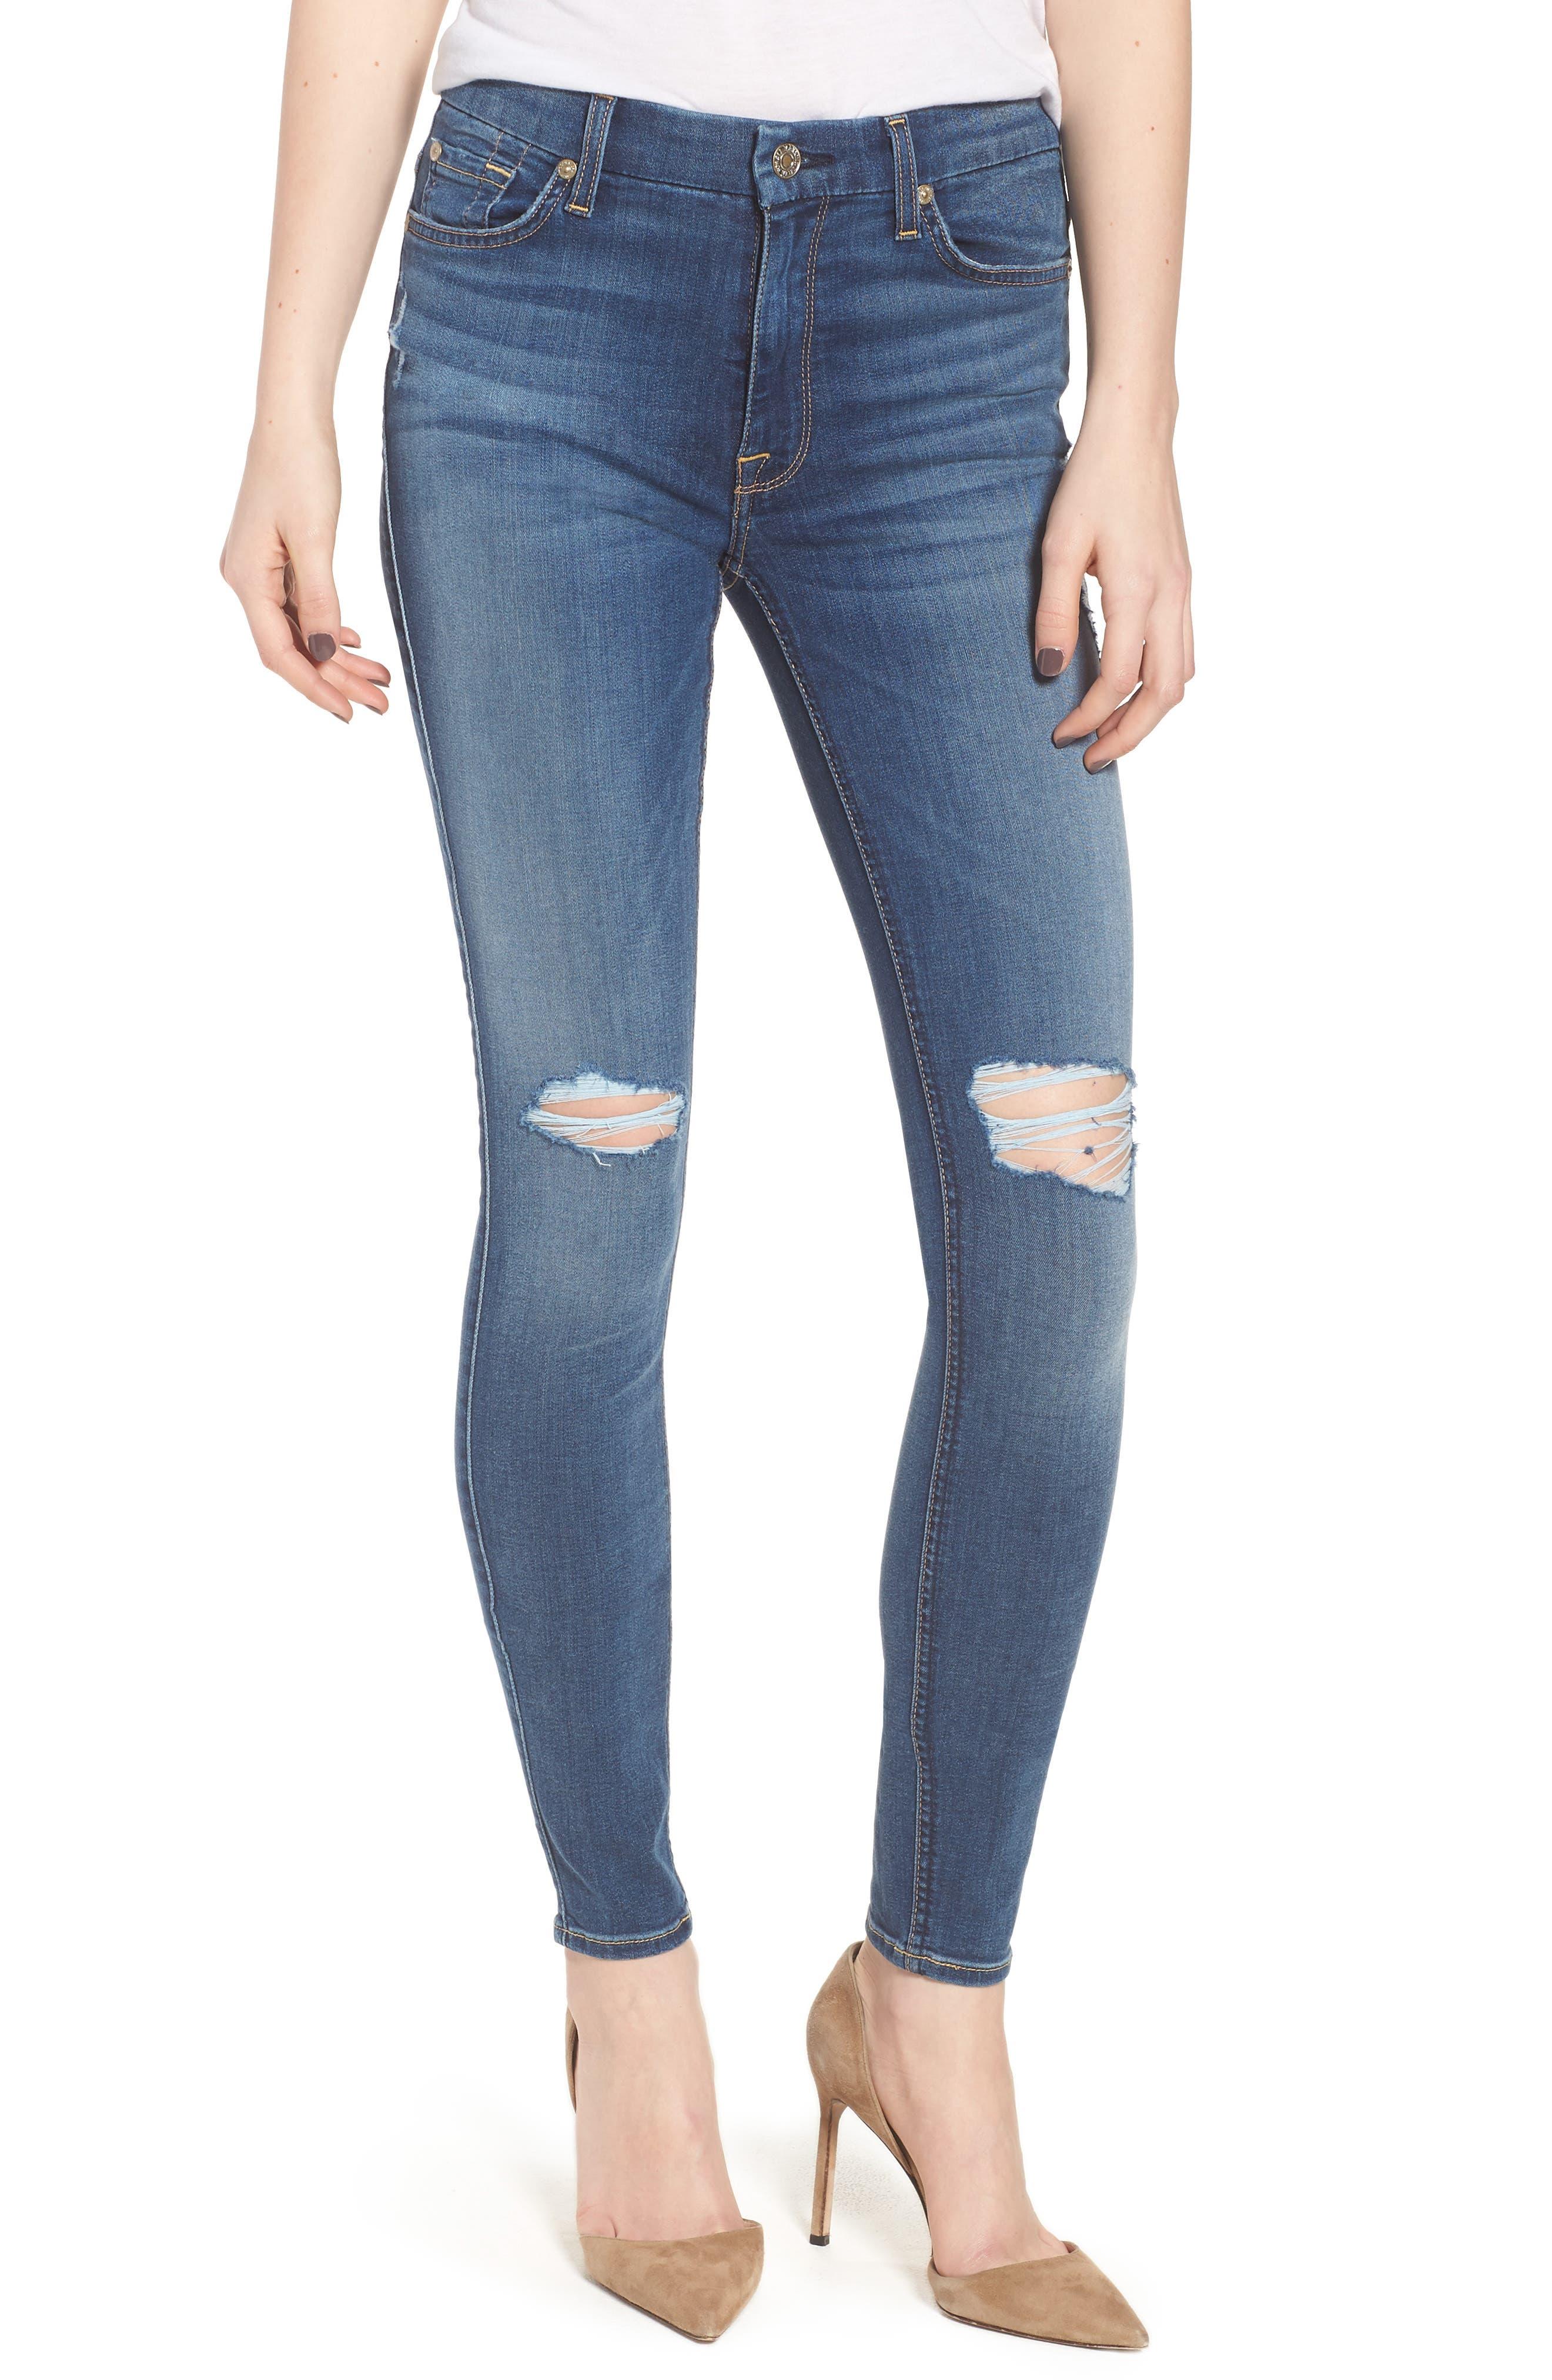 'b(air) - The Ankle' Skinny Jeans,                             Main thumbnail 1, color,                             Bair Vintage Dusk 2